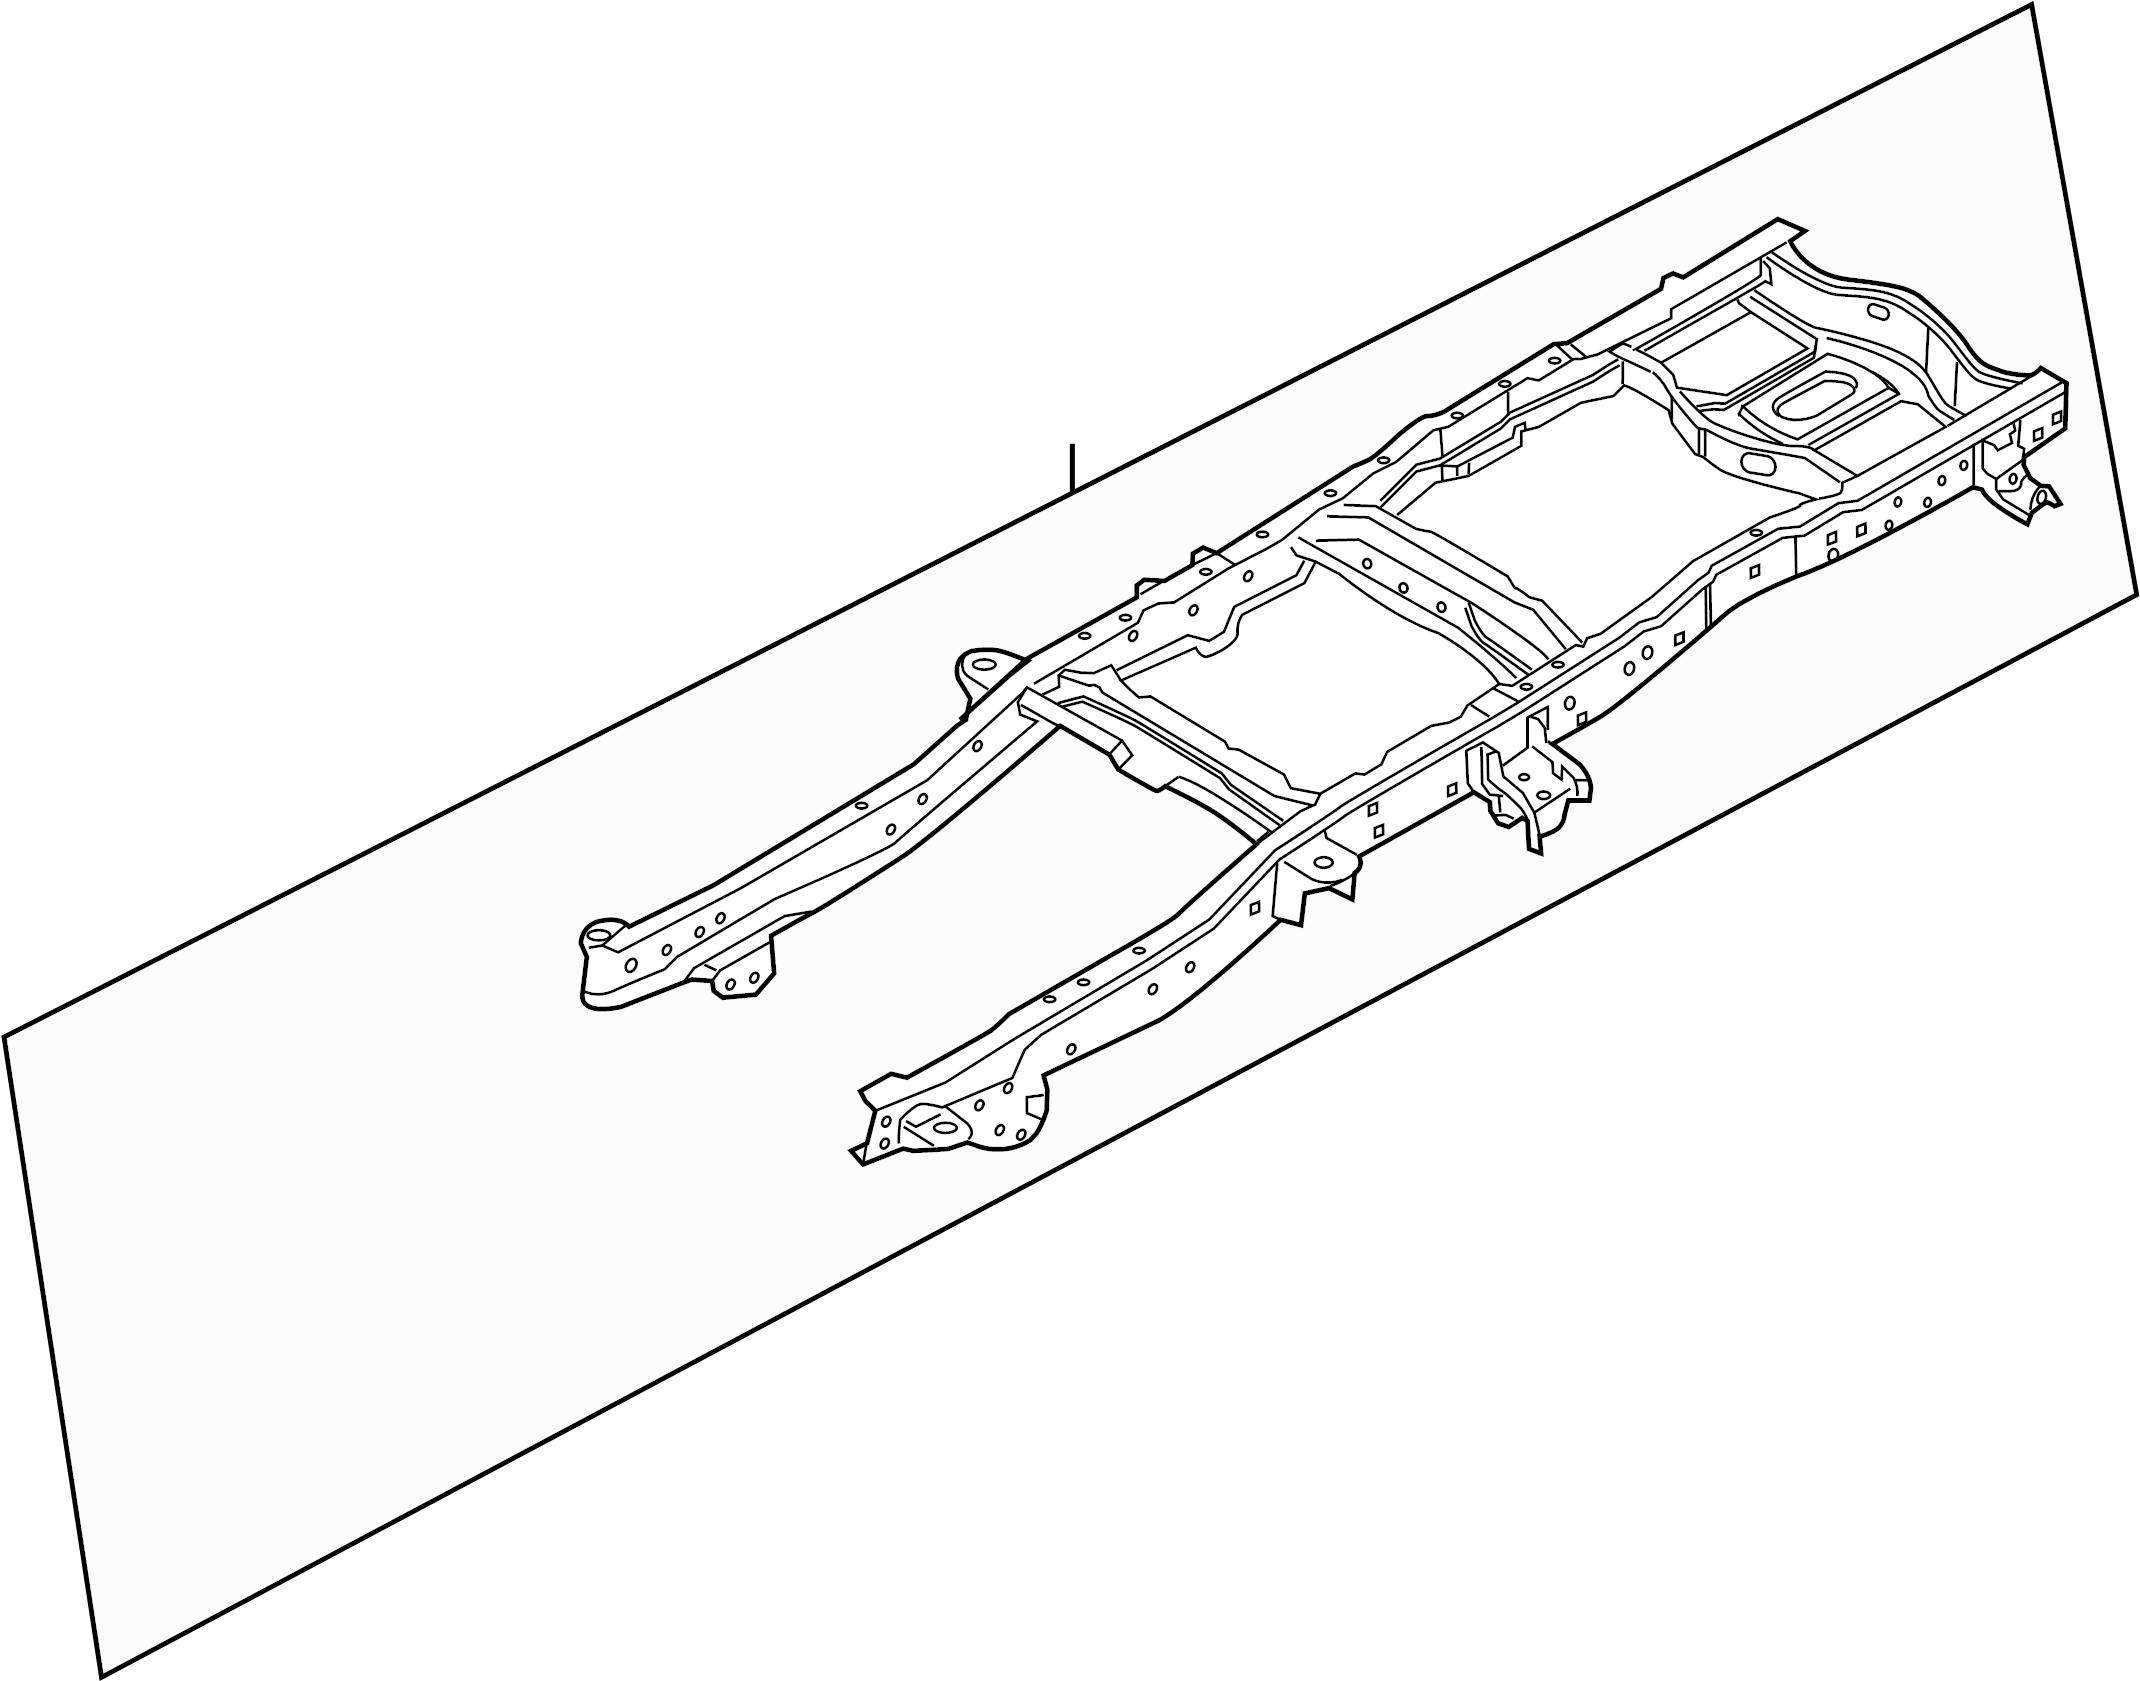 Ford F-250 Super Duty Frame Rail